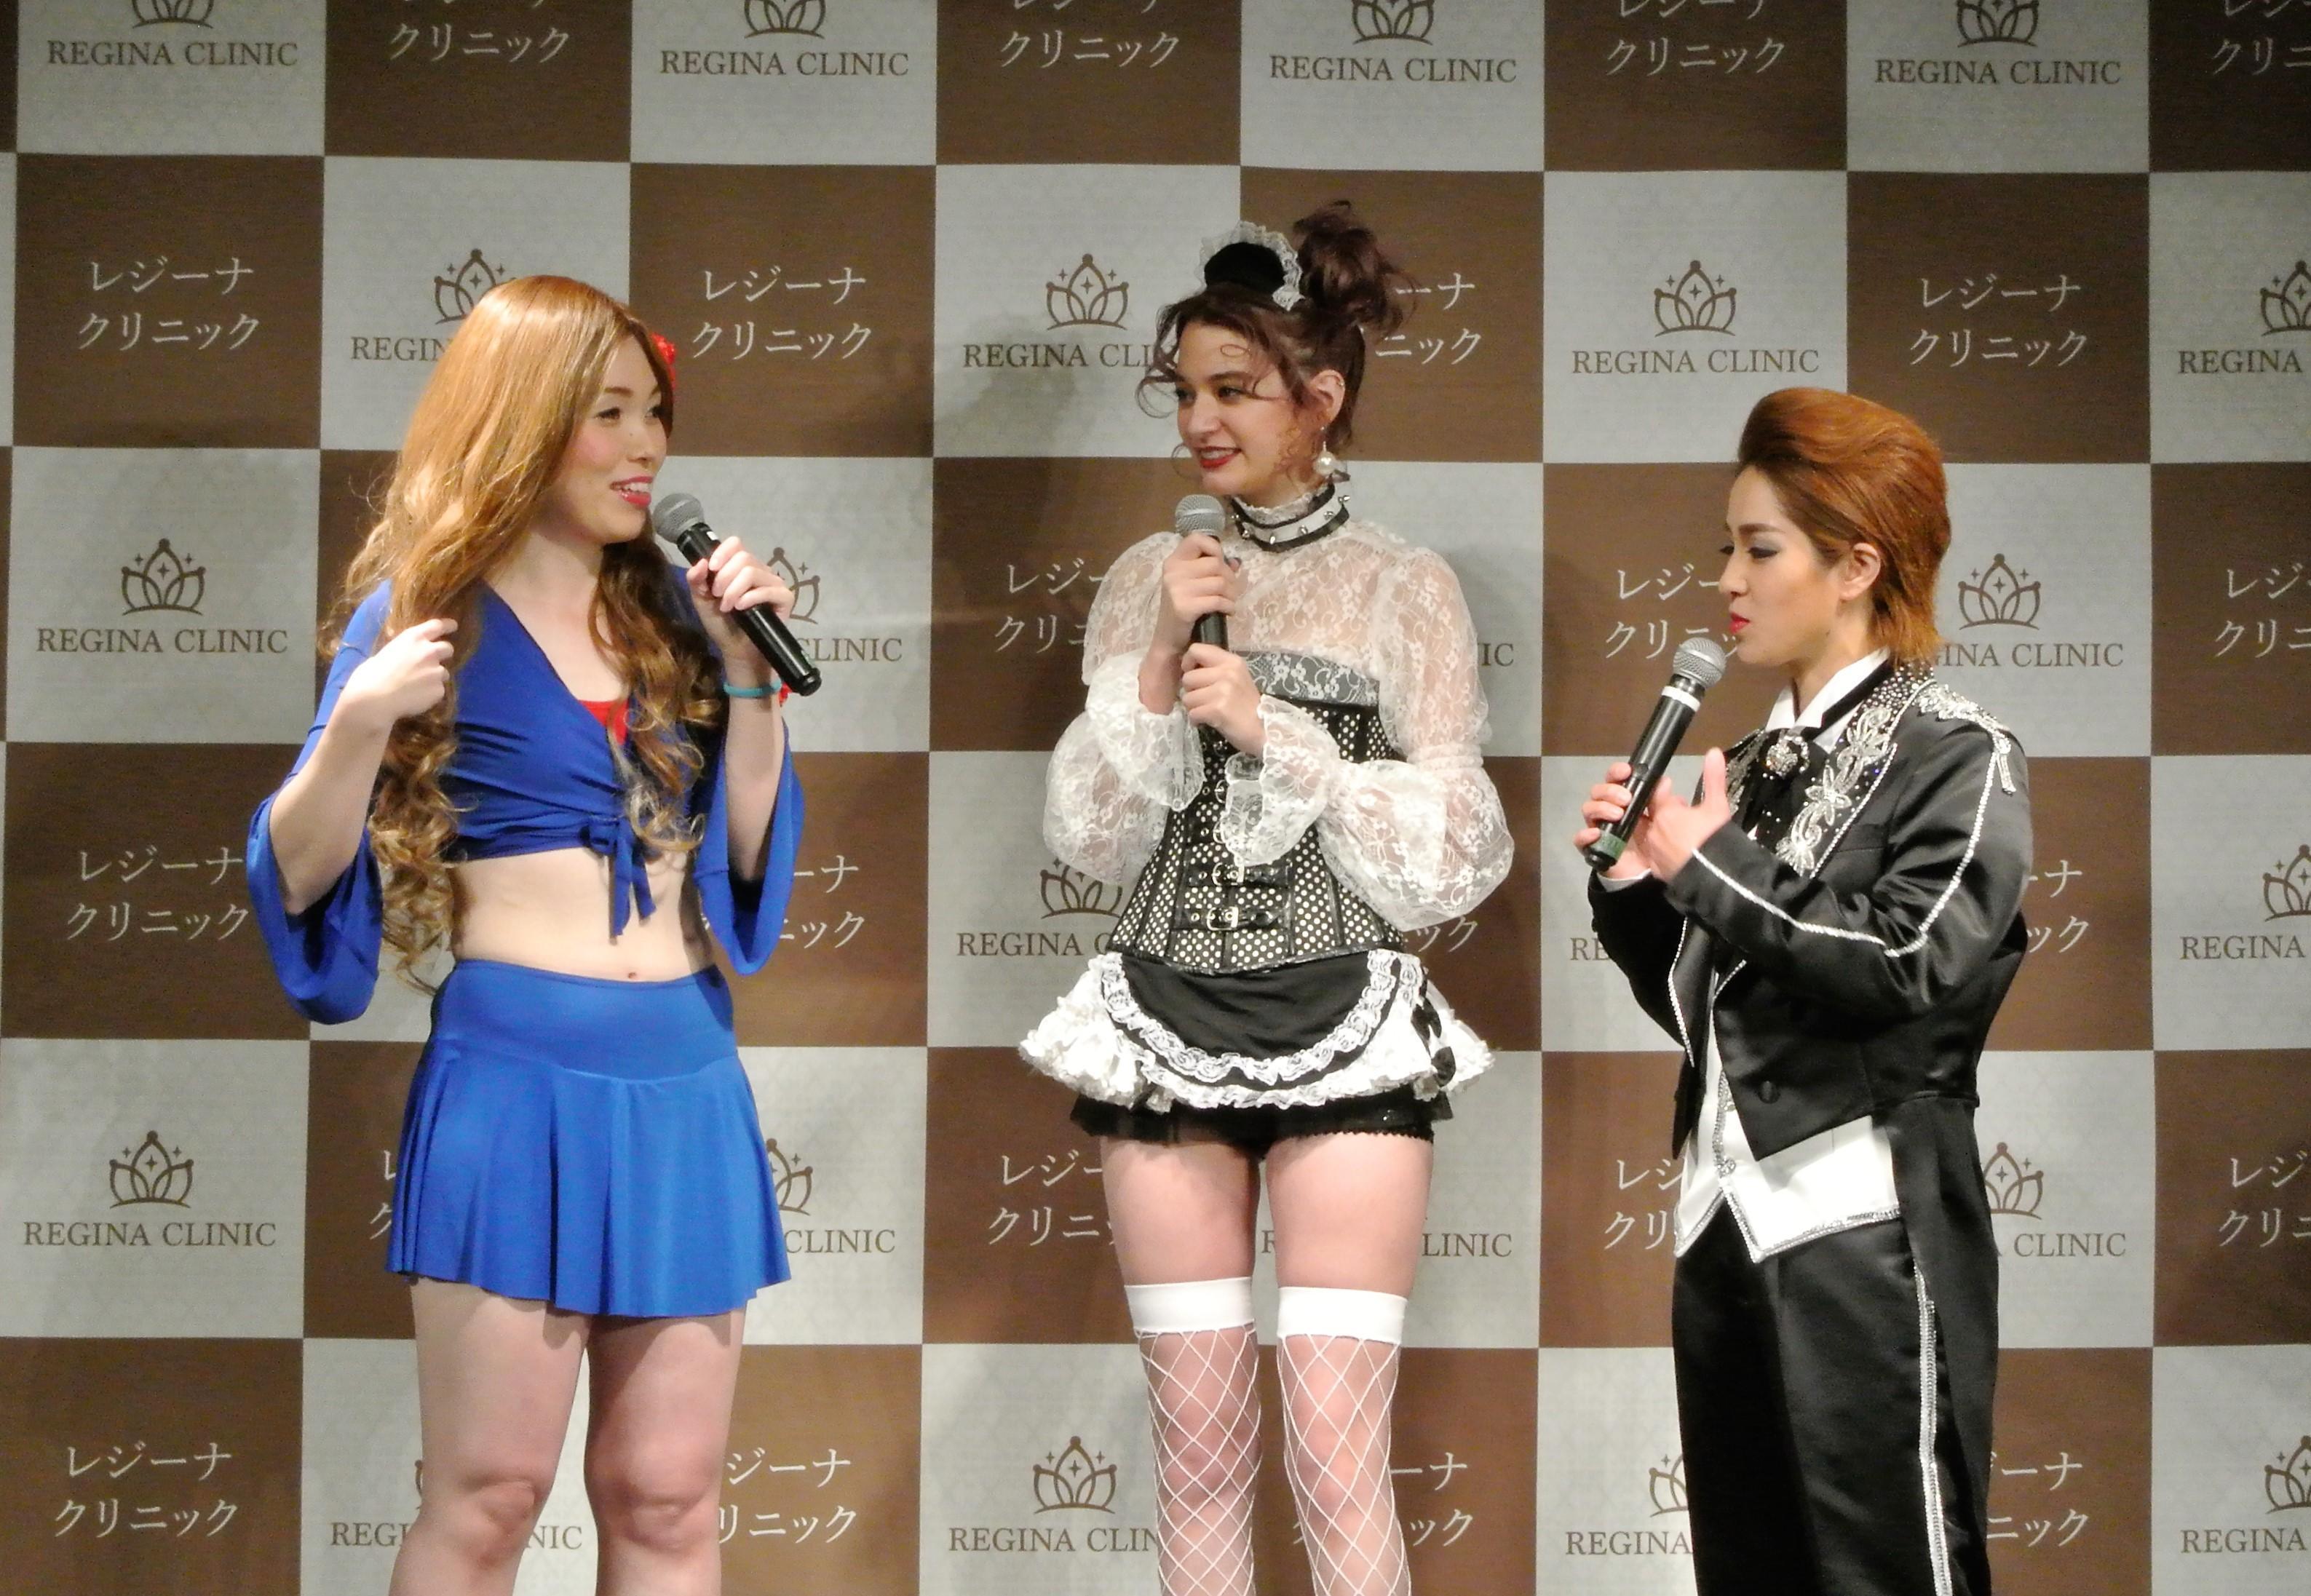 http://news.yoshimoto.co.jp/20171106125507-dbb0dd999b3ce855eb9d572a9289d38d5e0017ad.jpg